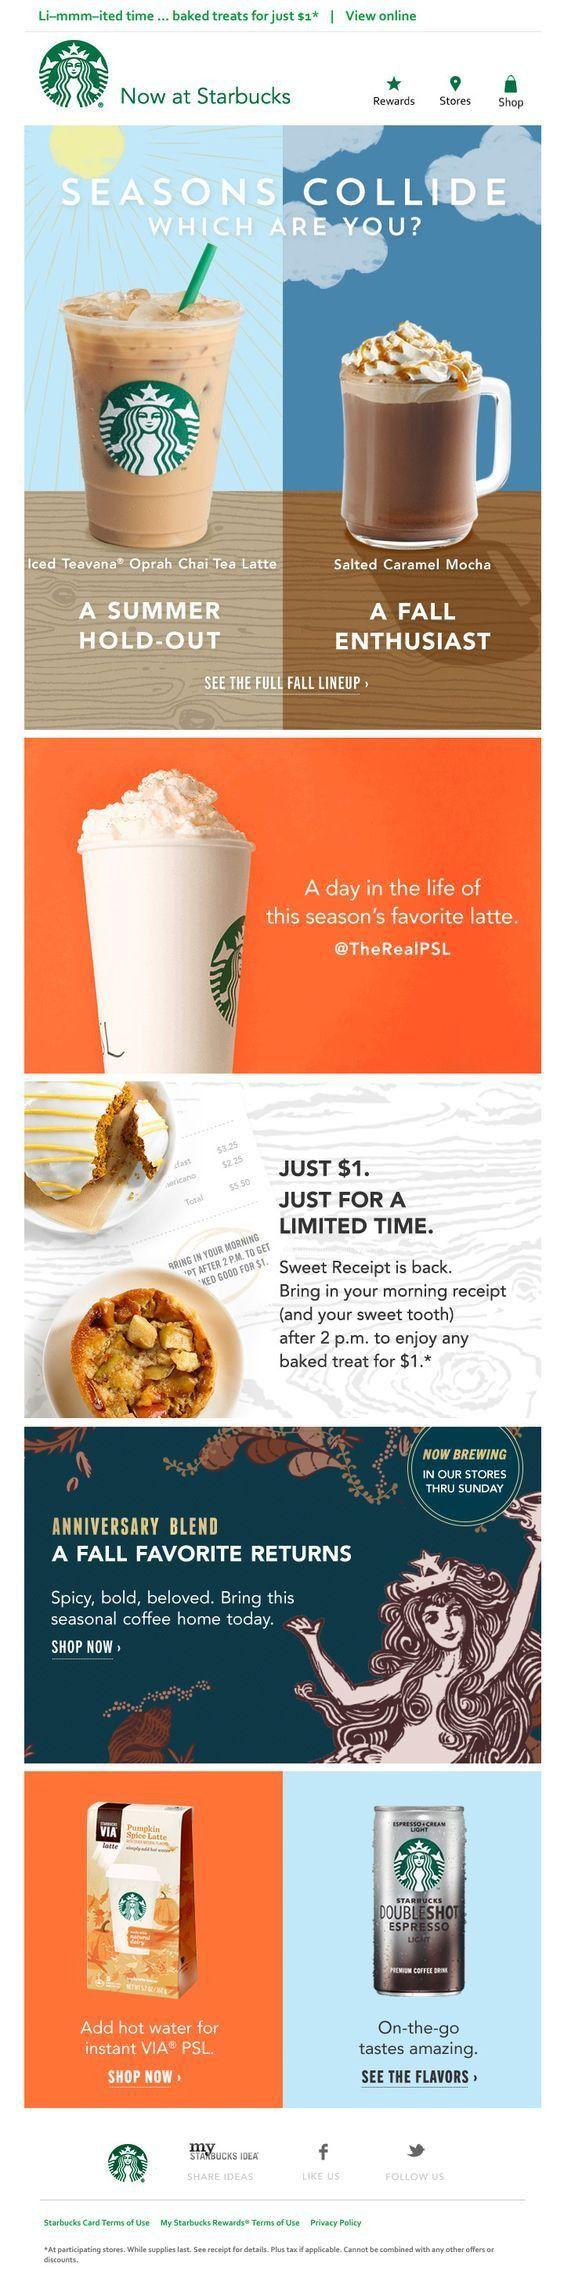 Email Template Size Fluid Design Starbucks Example Email Design Email Newsletter Design Email Marketing Template Design